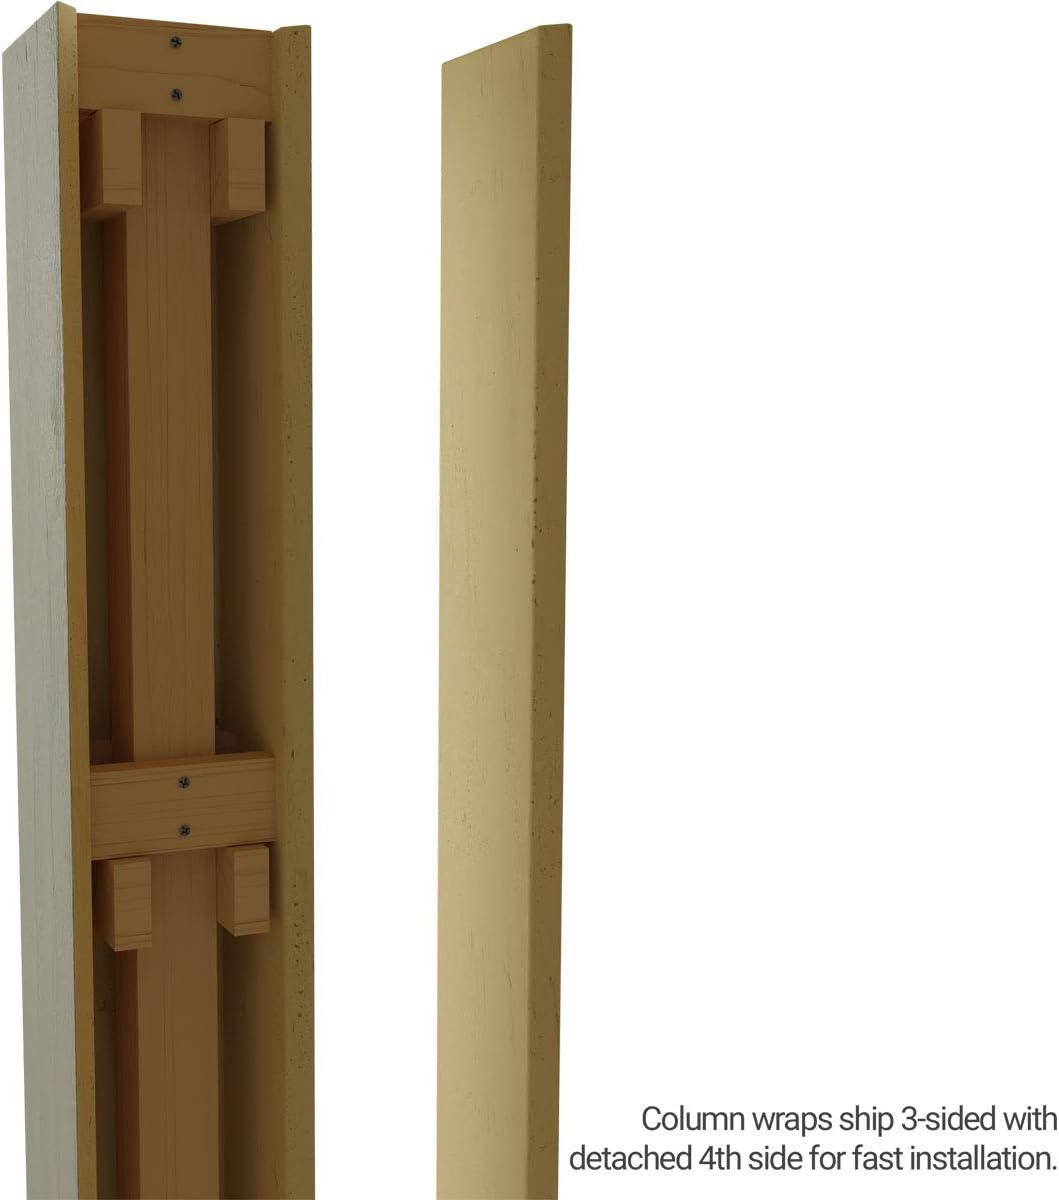 Amazon Com Ekena Millwork Colurs06x072stuf Rough Sawn Endurathane Faux Wood Non Tapered Square Column Wrap 6 W X 6 H Unfinished Home Improvement